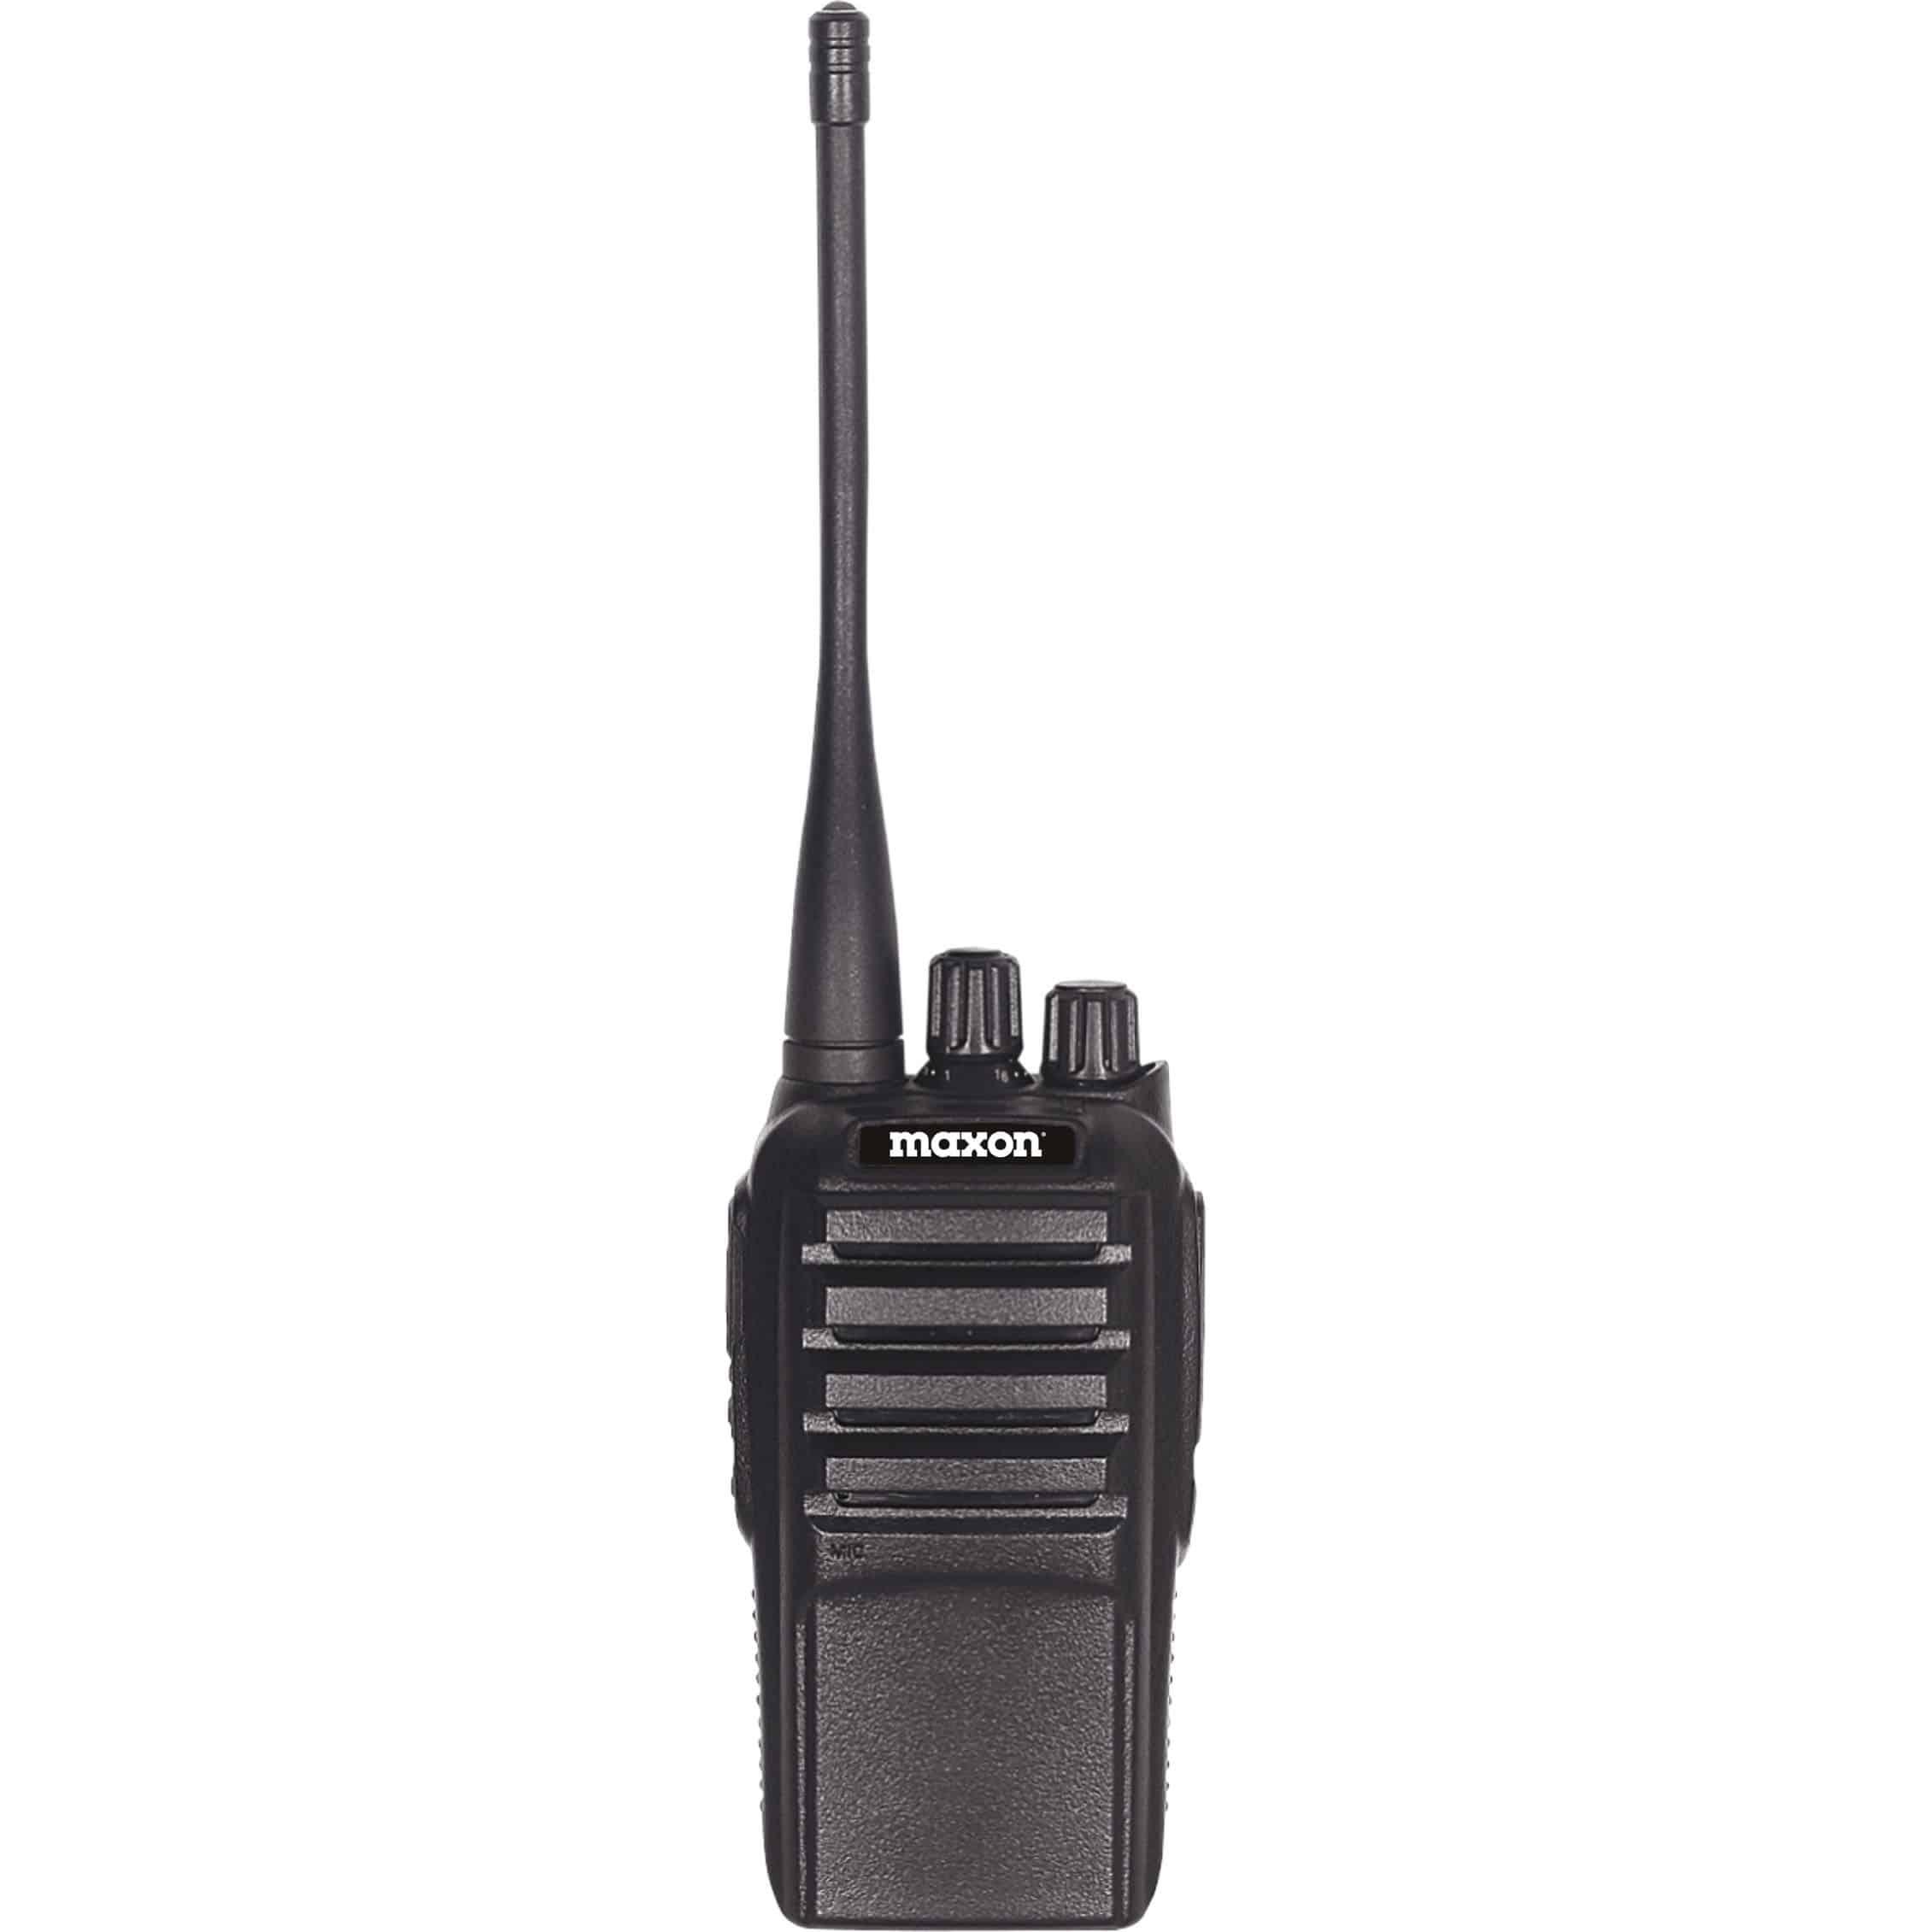 TS2116 - Maxon Professional Handheld VHF Radio